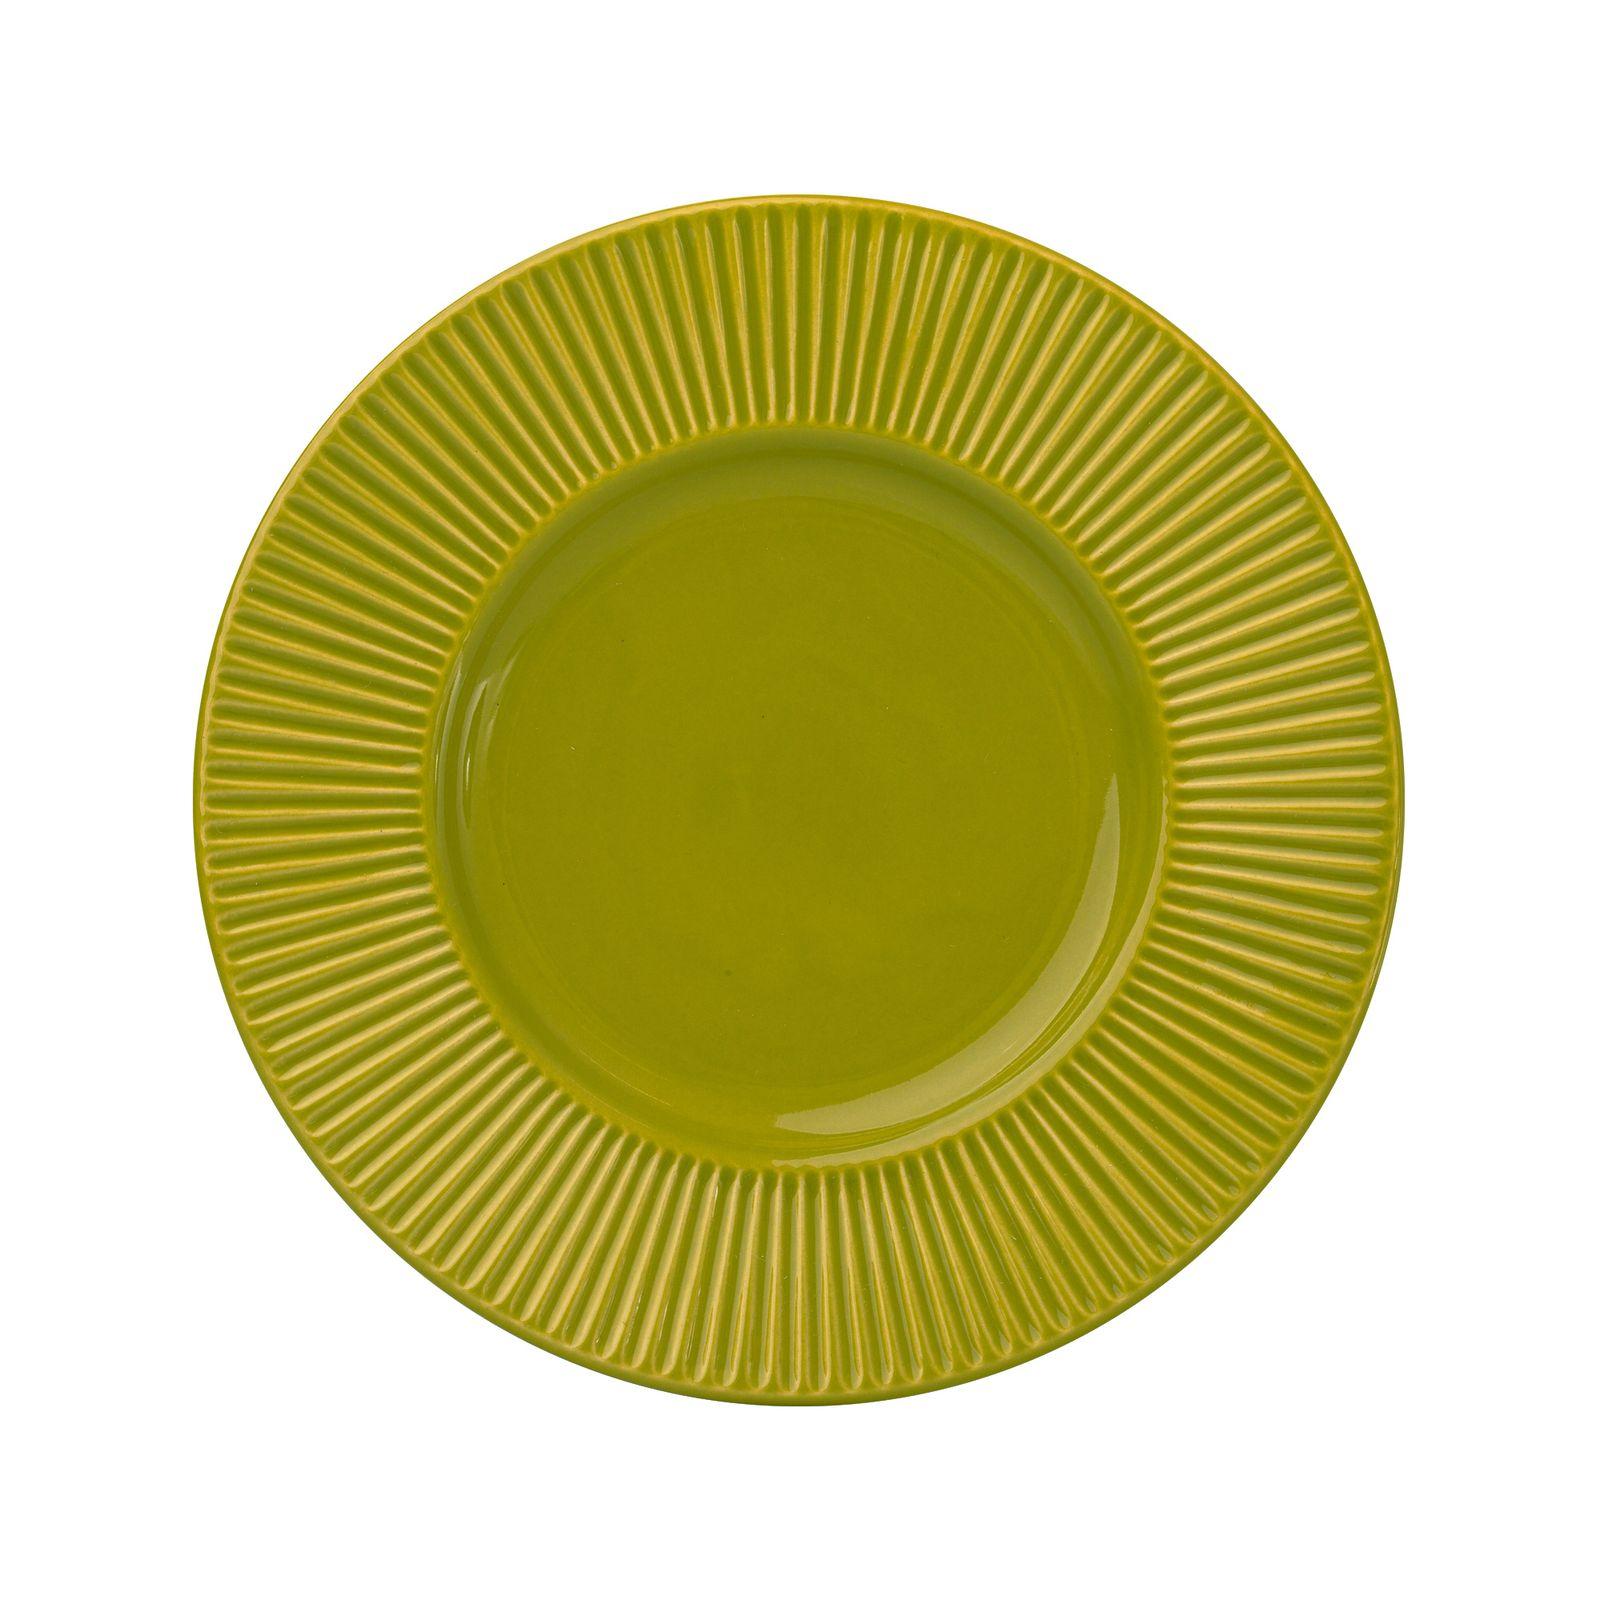 Dessert plate Palette 22.5 cm AMBITION Lime green